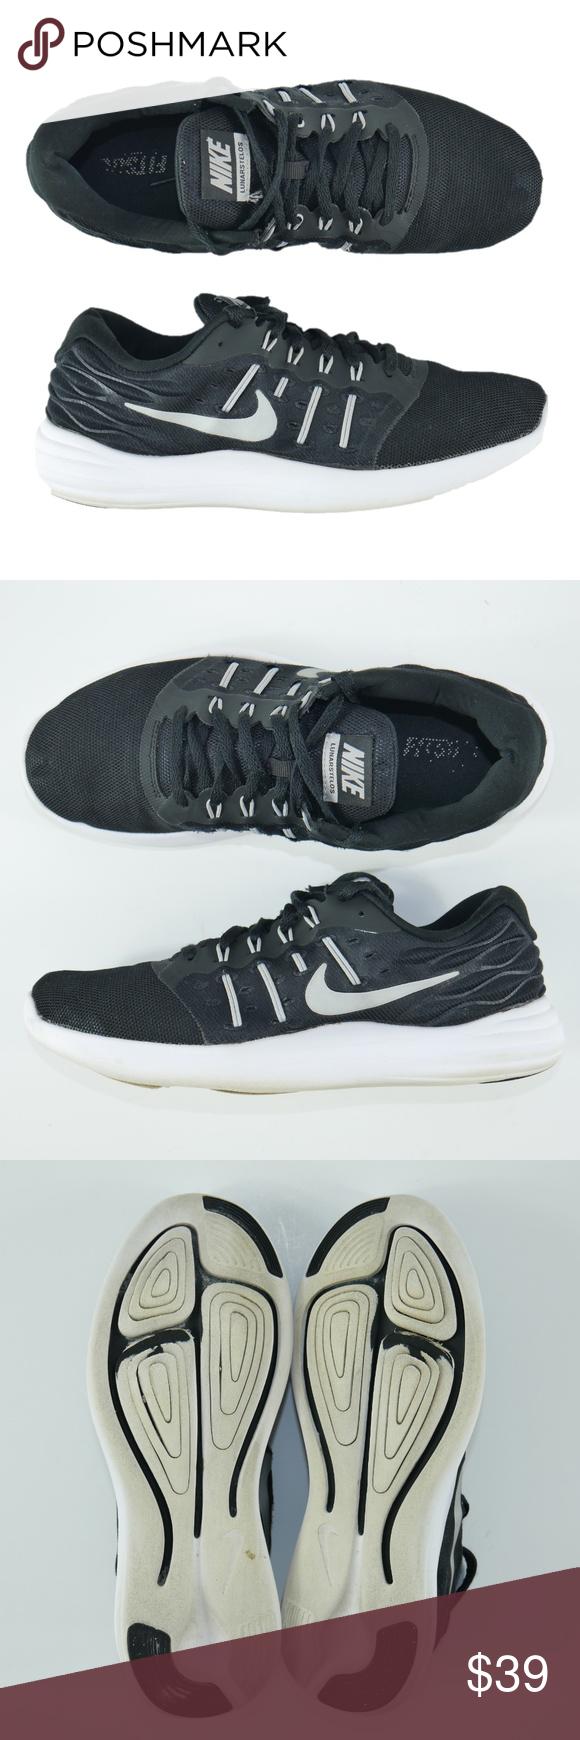 3989a883917e Nike Lunarstelos Athletic Training Shoes Running Nike Lunarstelos Athletic  Training Shoes Running White Black Mens Sz